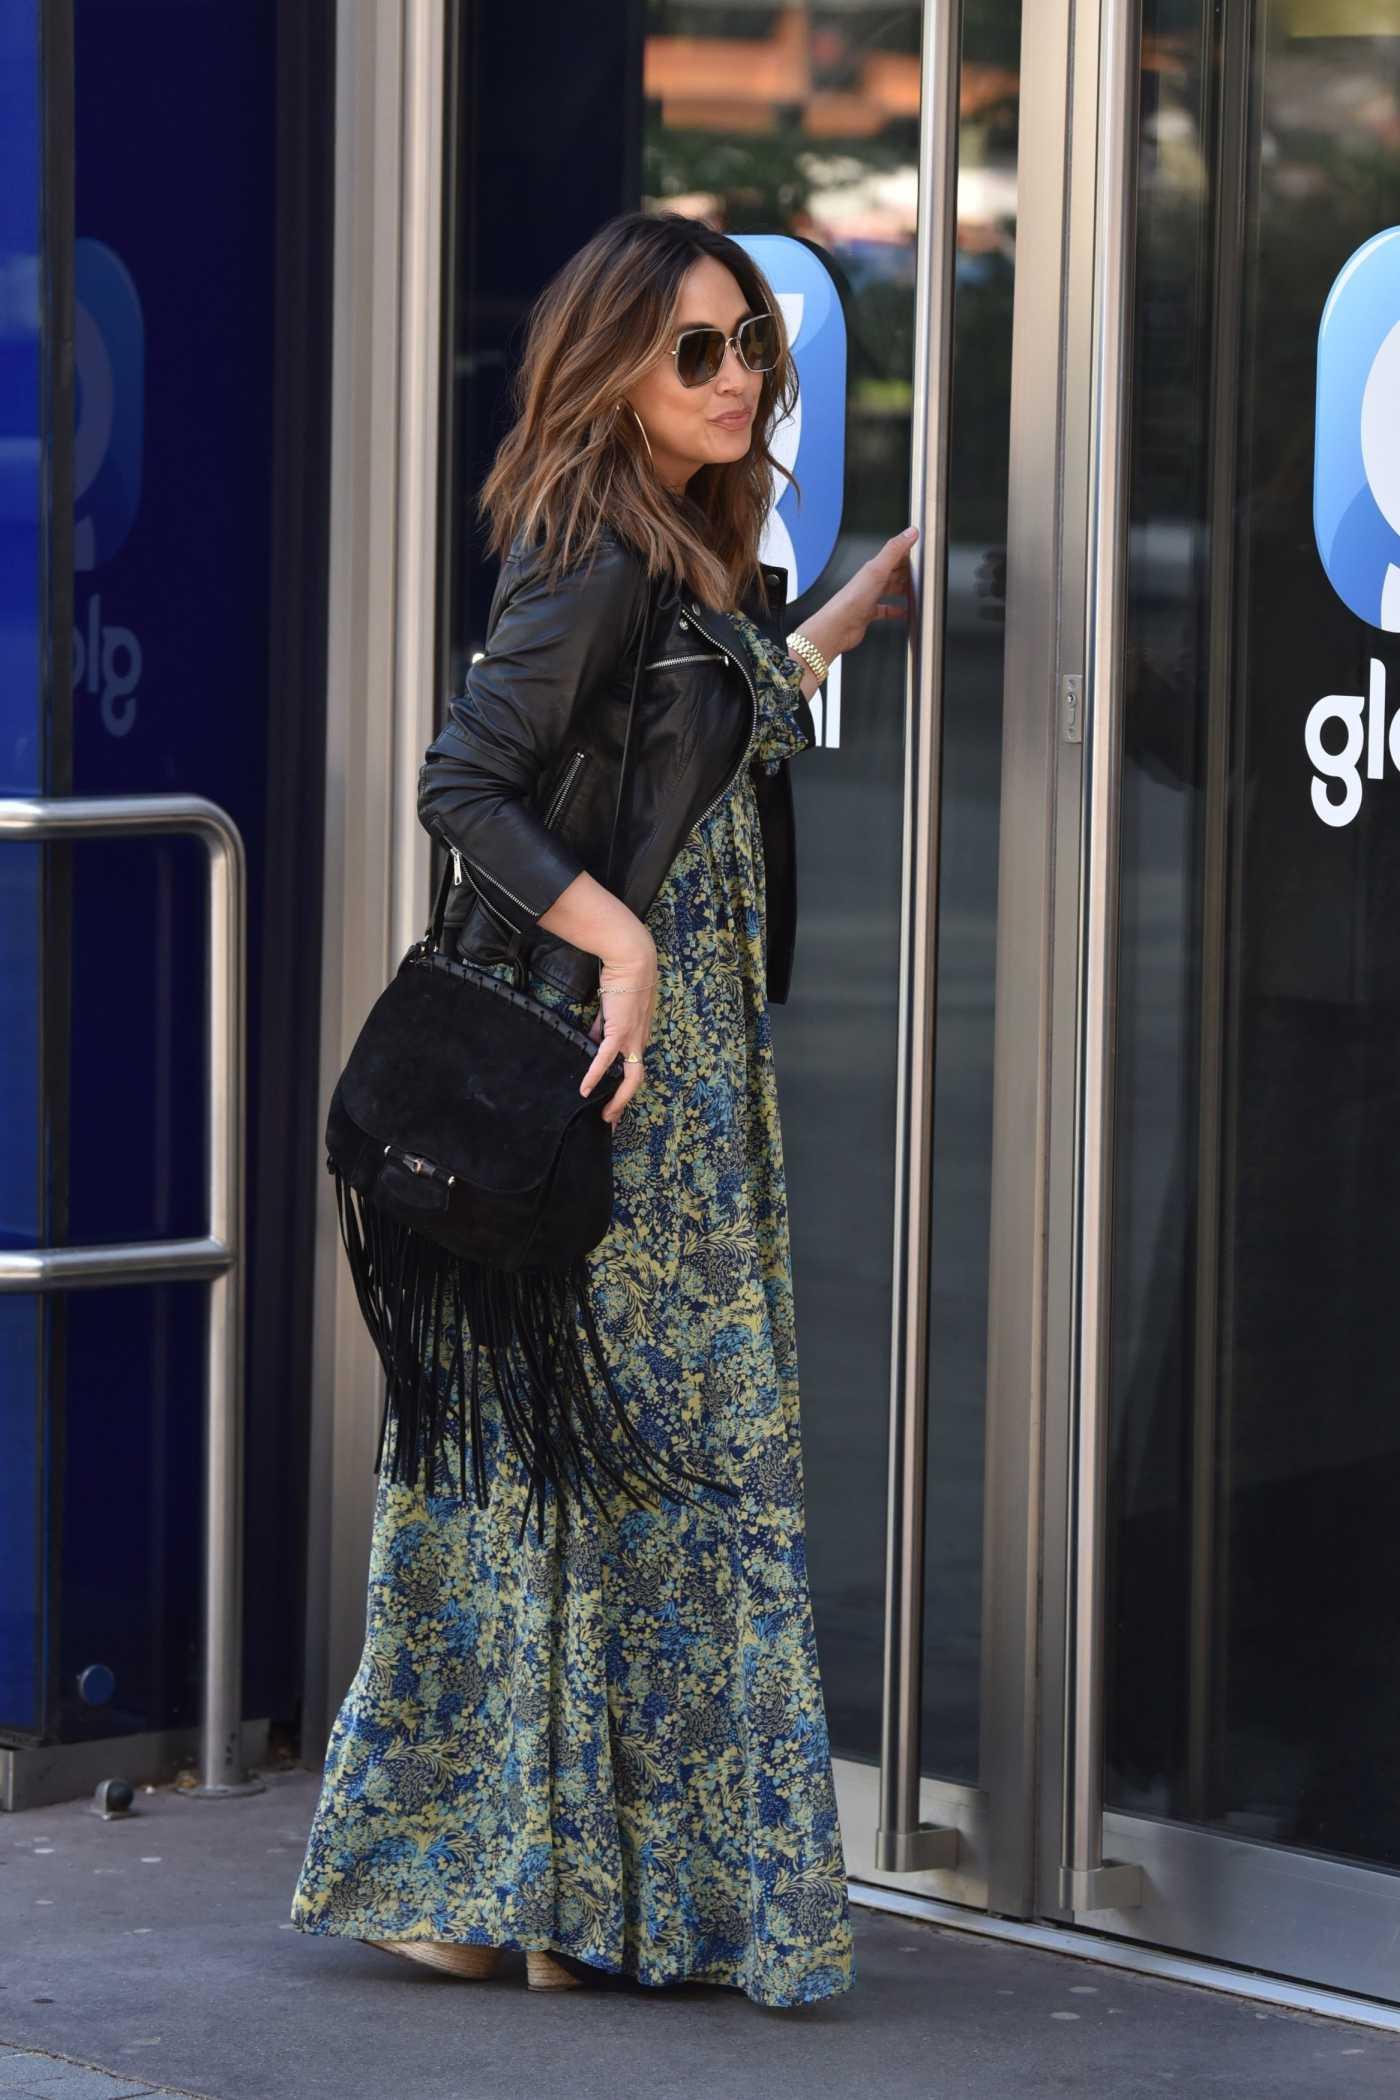 Myleene Klass in a Black Leather Jacket Leaves the Global Studios in London 04/23/2020